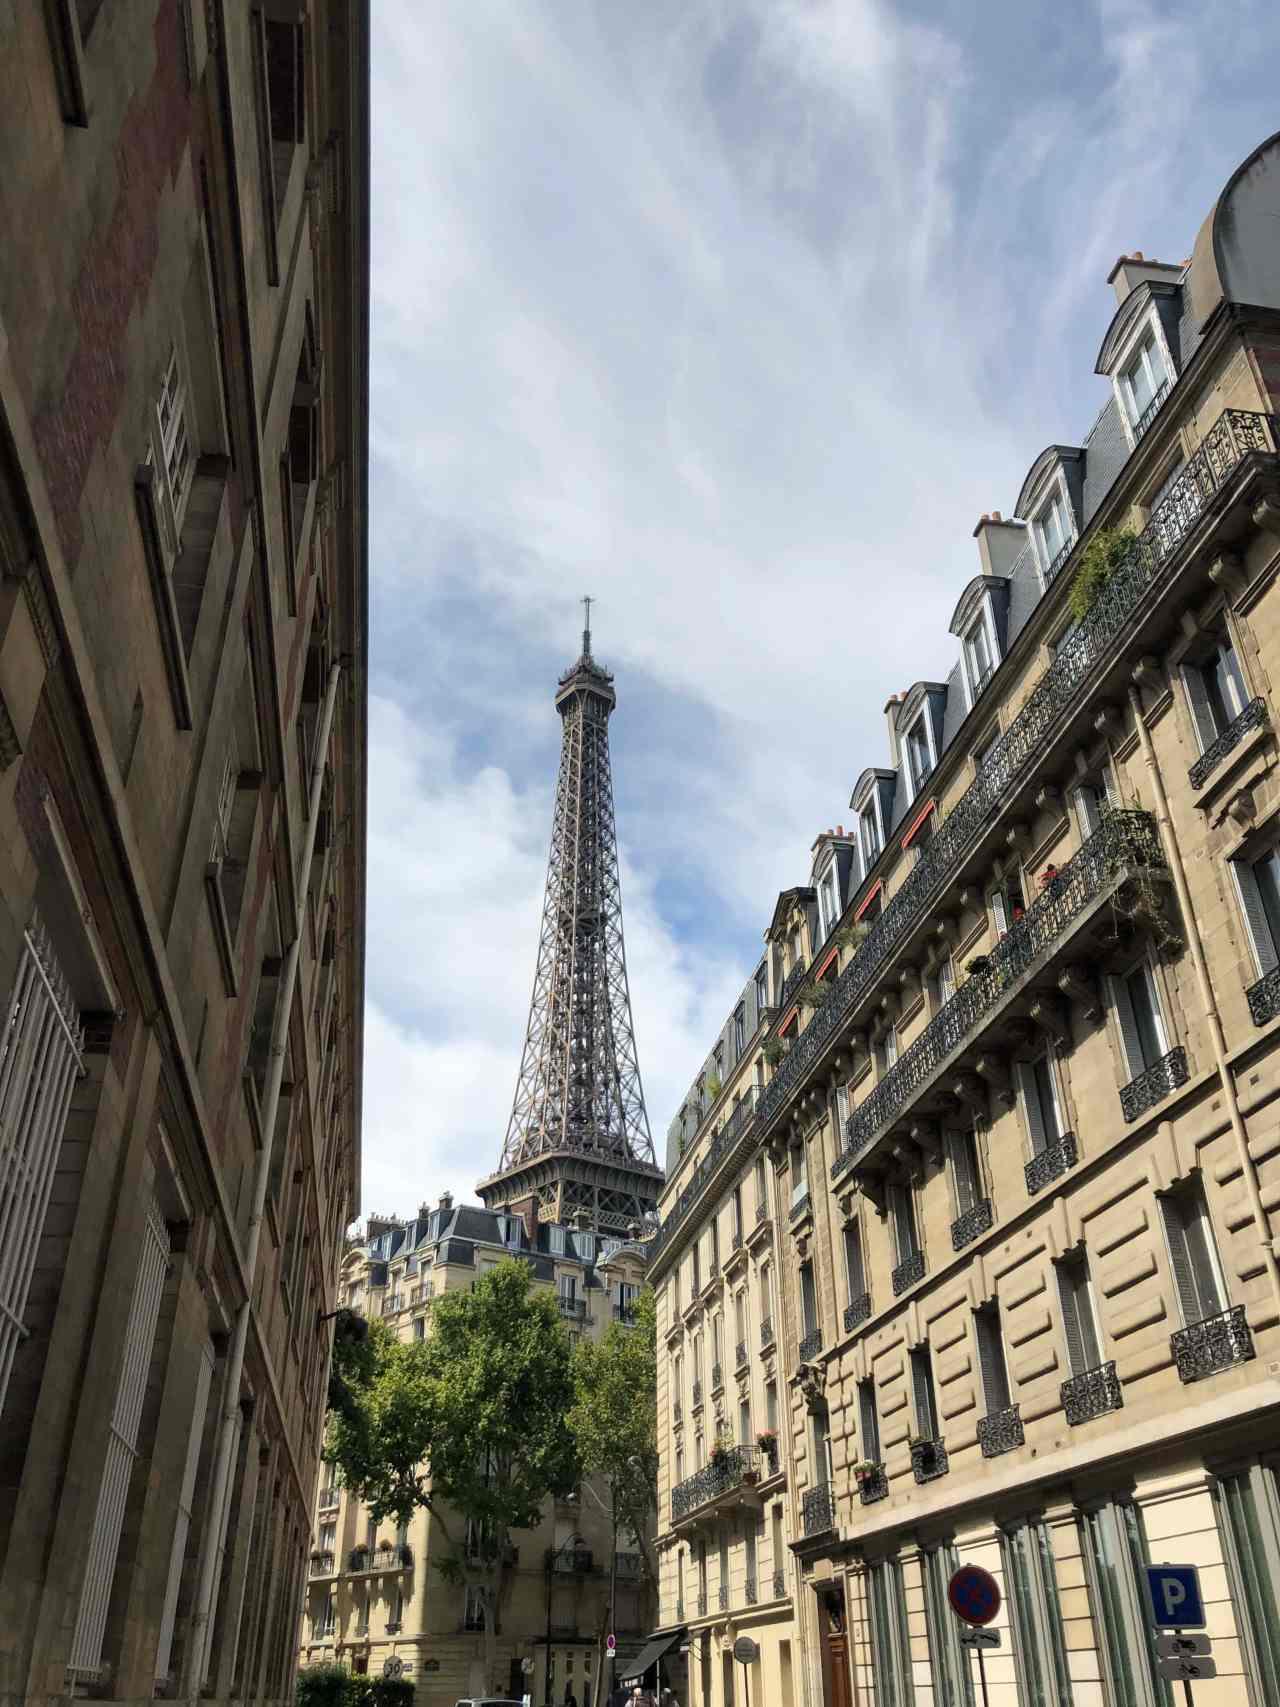 Street view of Eiffel Tower